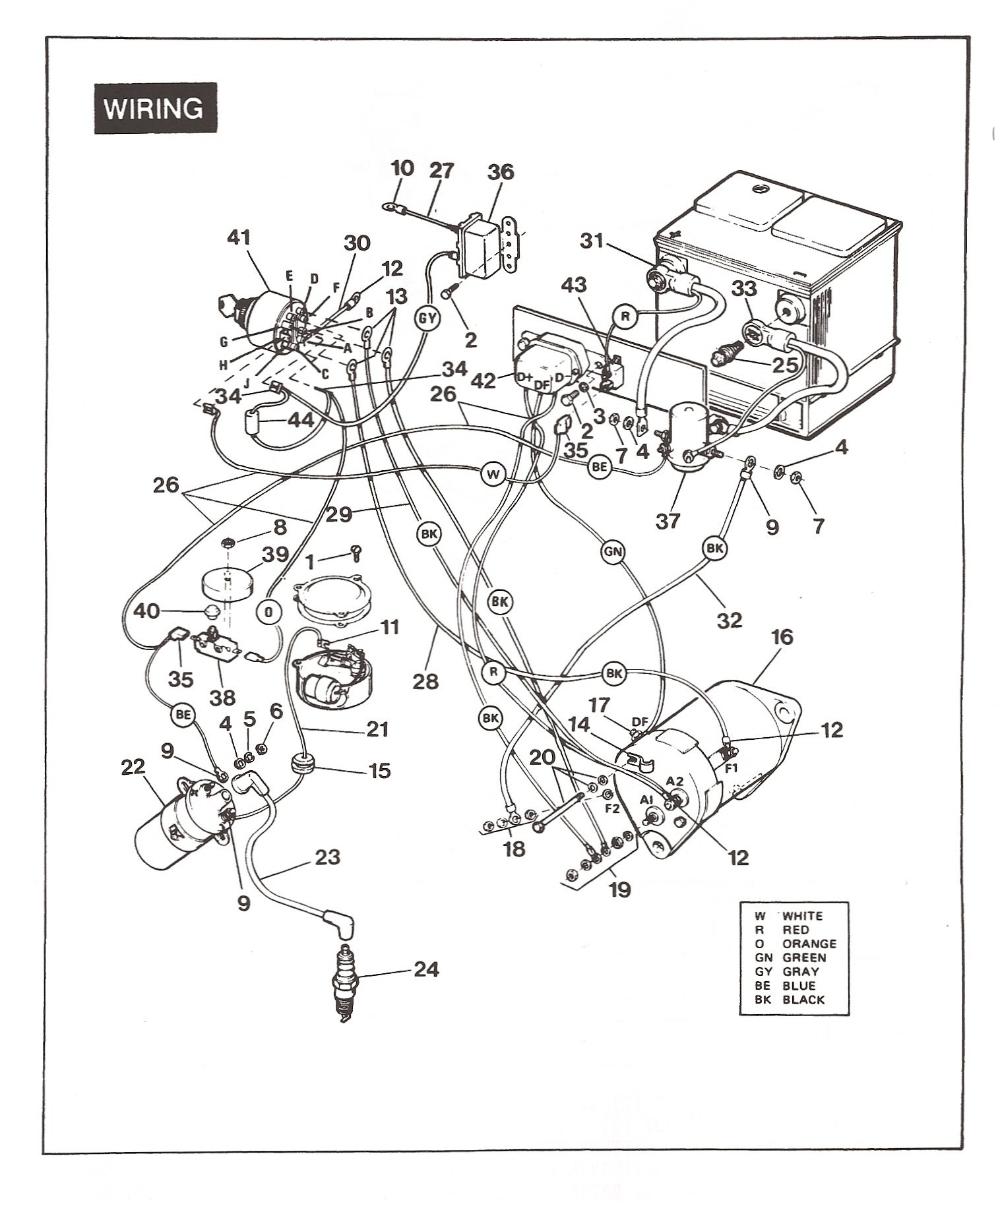 Pin By S Mckee On Ezgo Golf Cart Club Car Golf Cart Golf Carts Ezgo Golf Cart